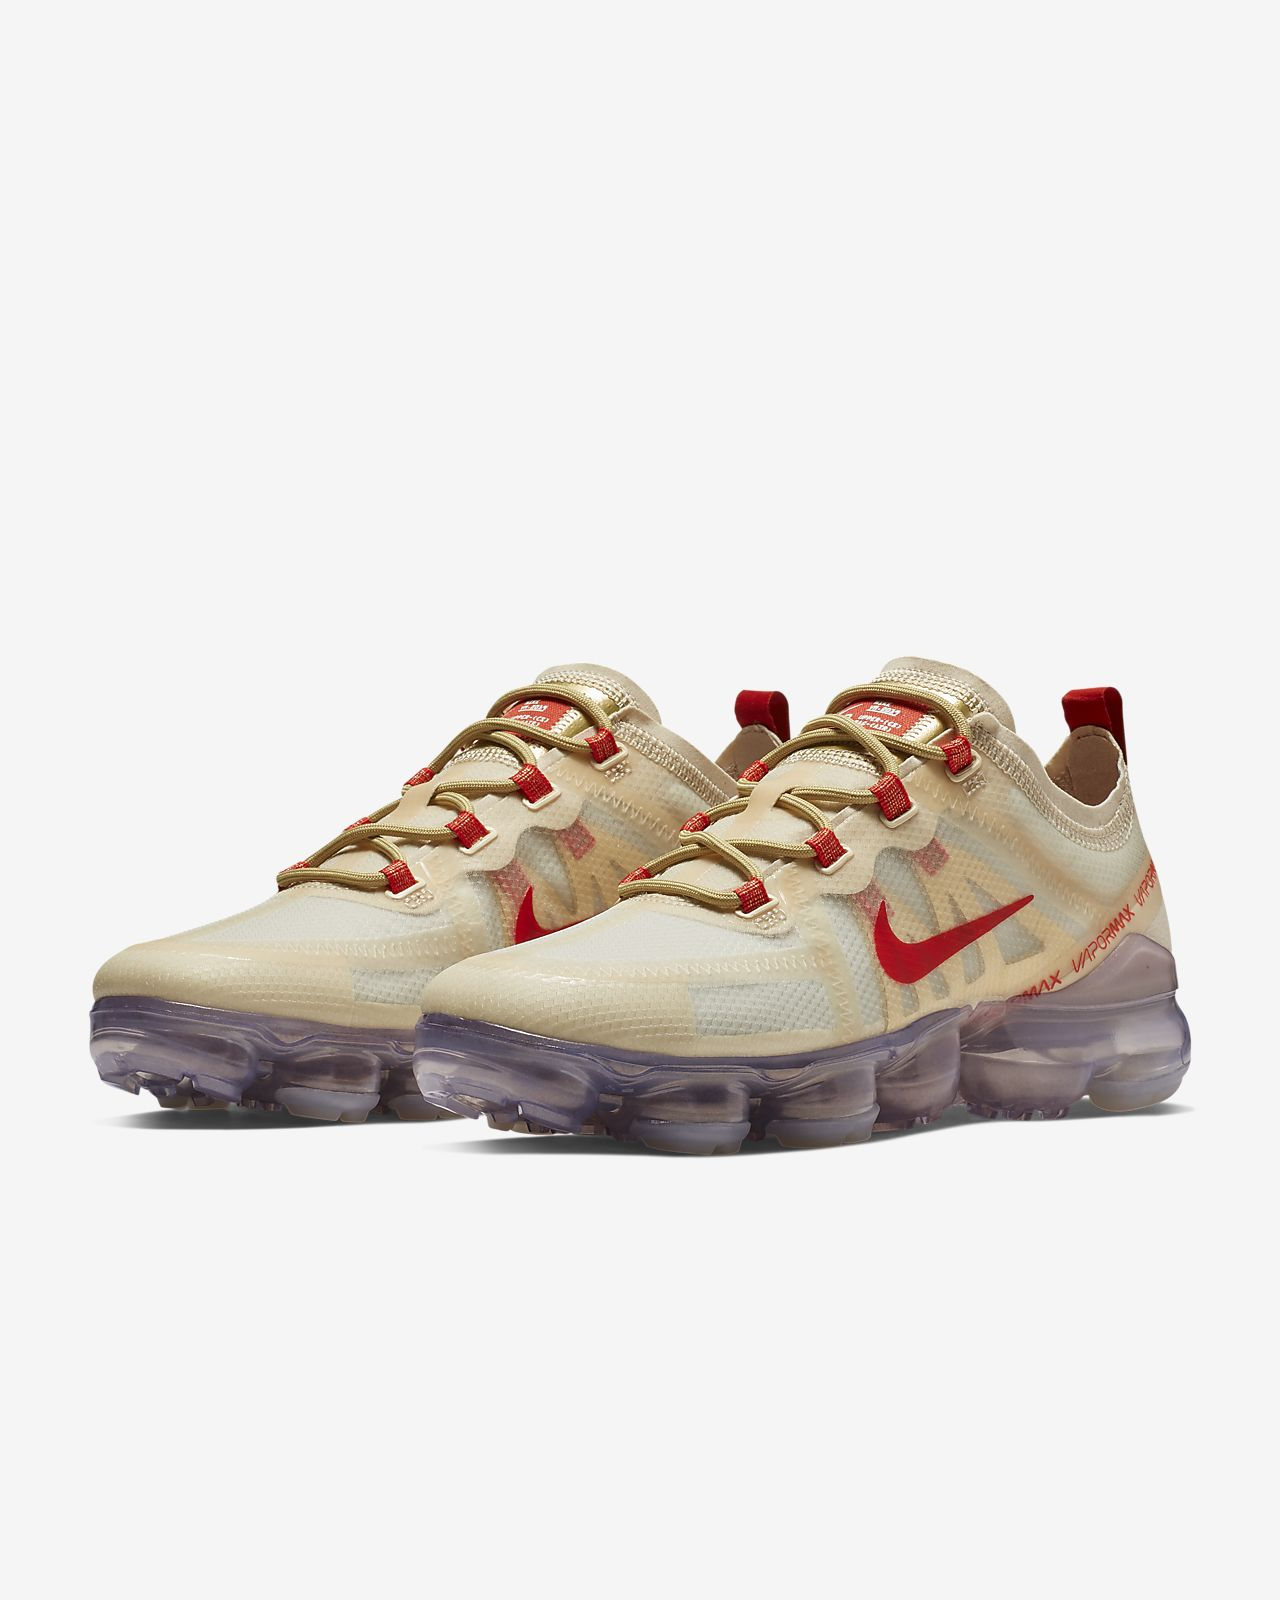 29ff5514893 Nike Air VaporMax 2019 CNY Women s Shoe. Nike.com CA